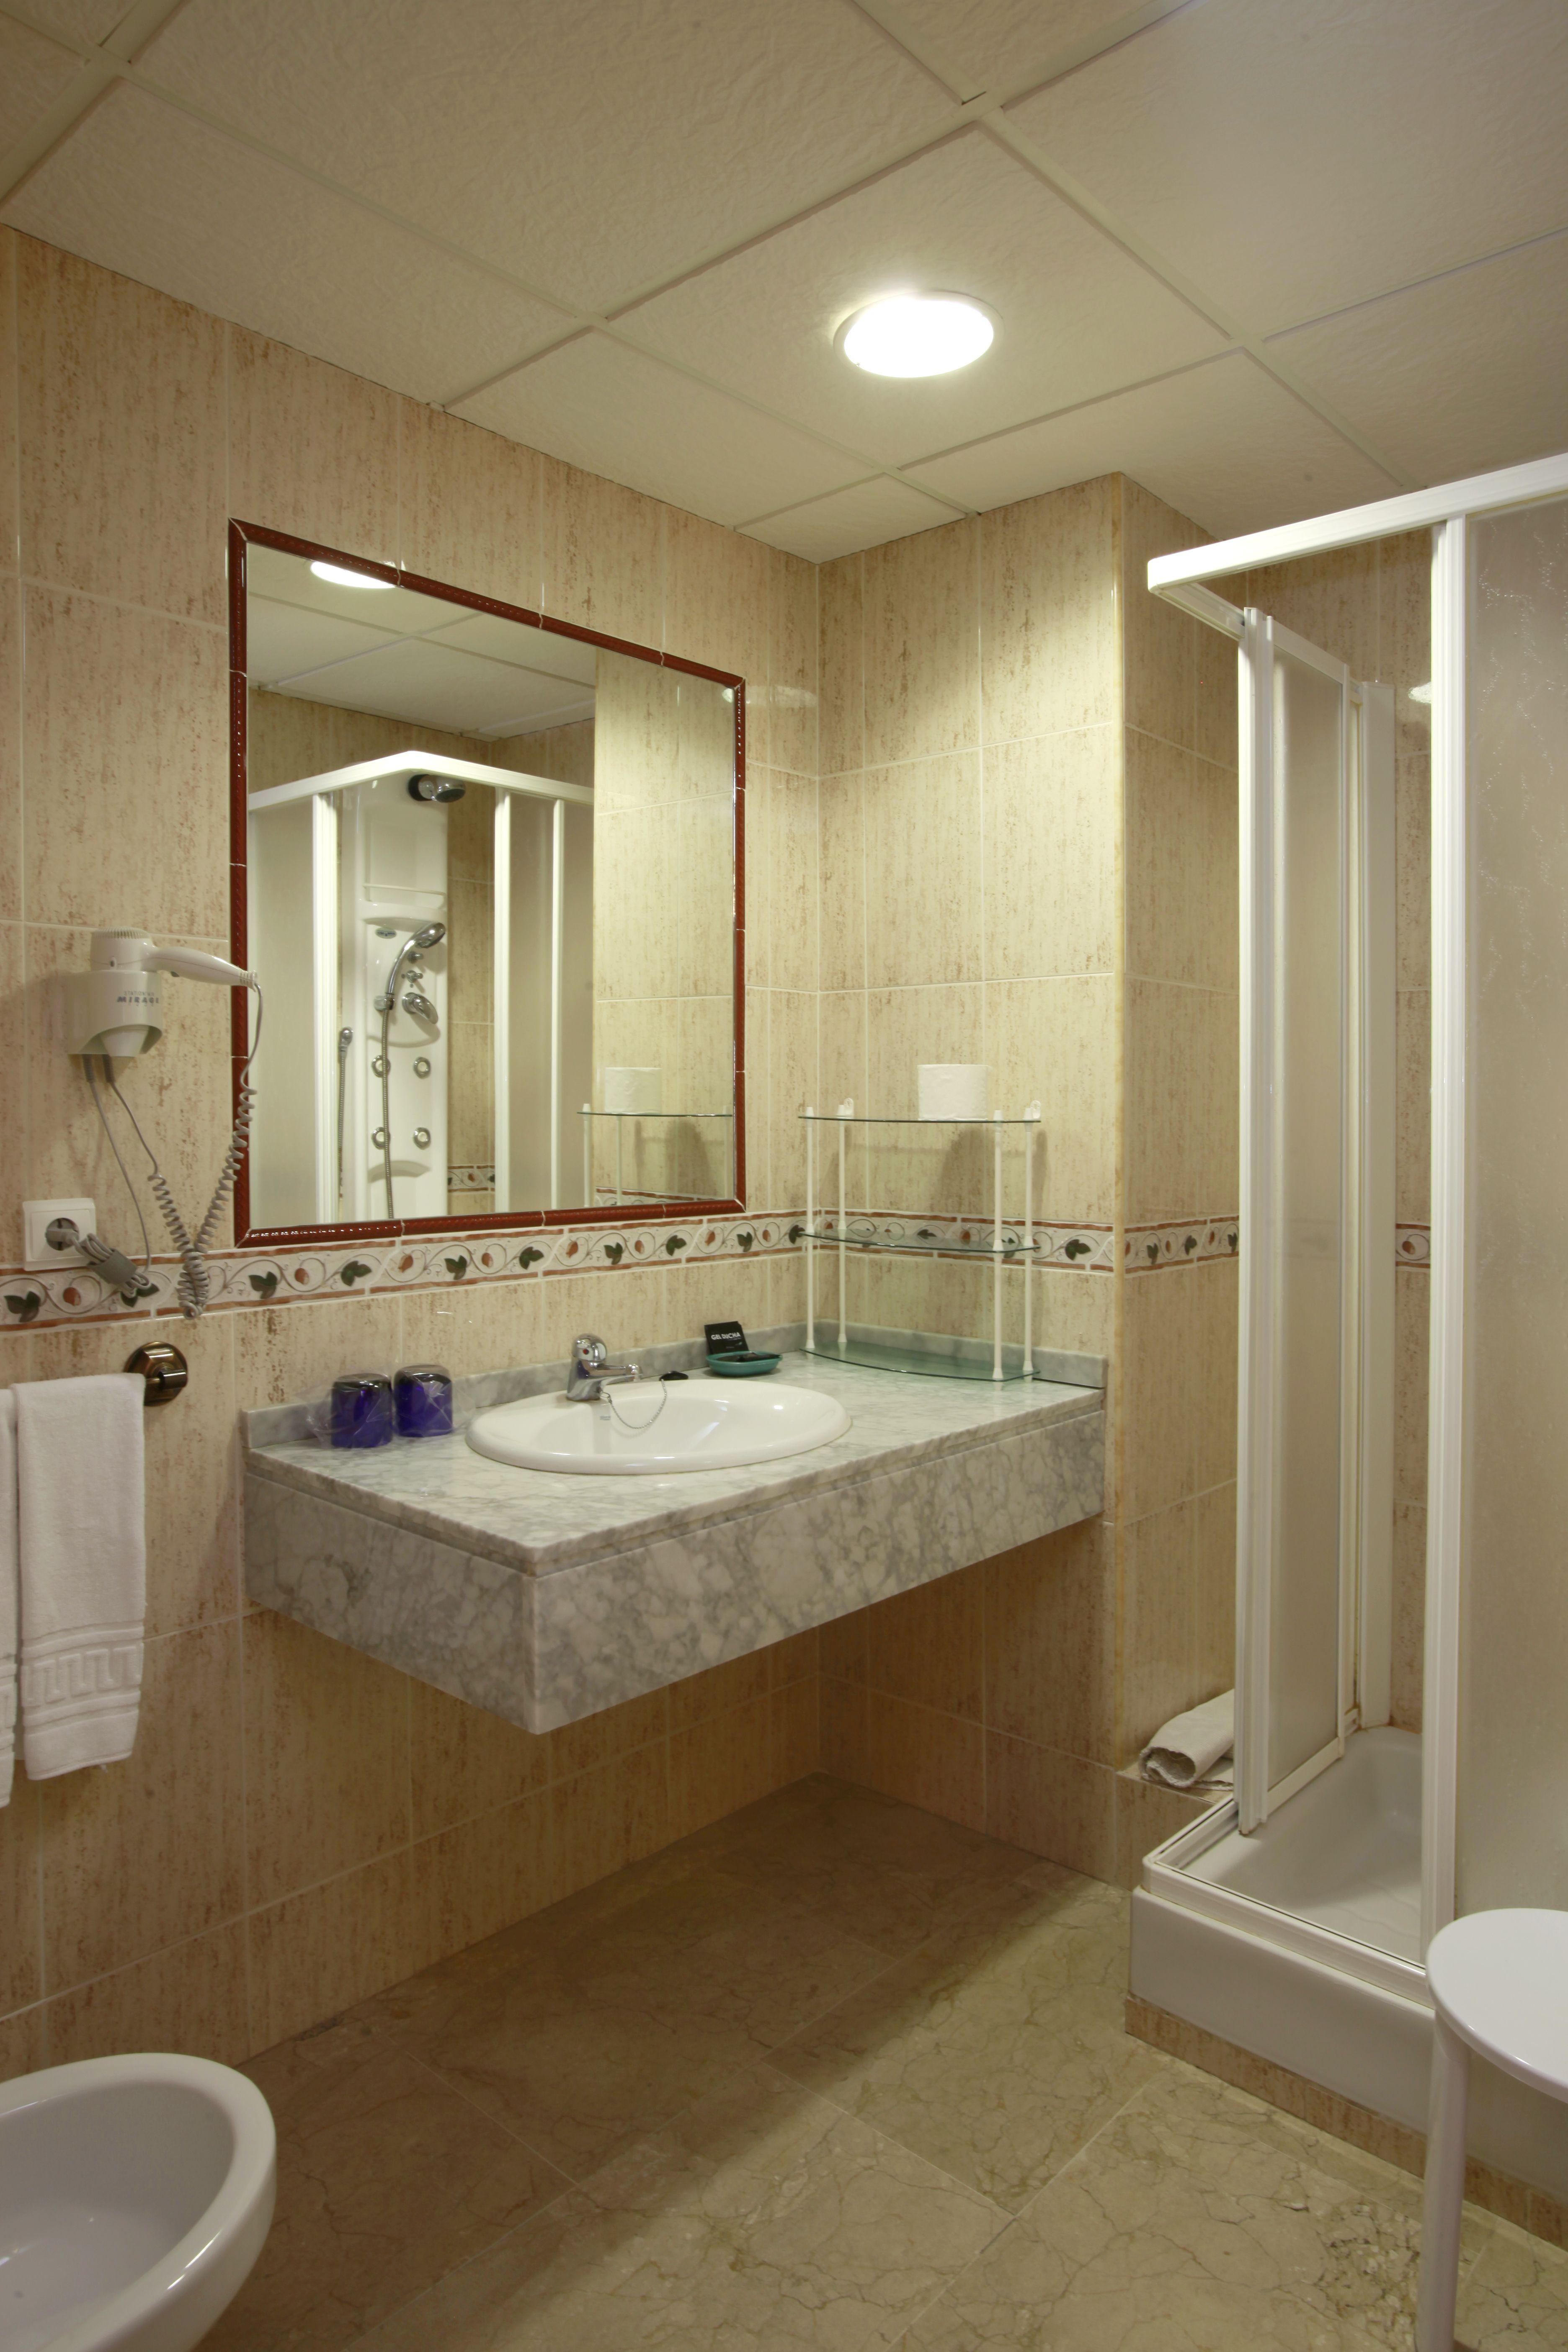 Cuarto de ba o completo con ducha tambi n disponemos de ba os con ducha y ba os adaptados para - Cuartos de bano modernos con ducha ...